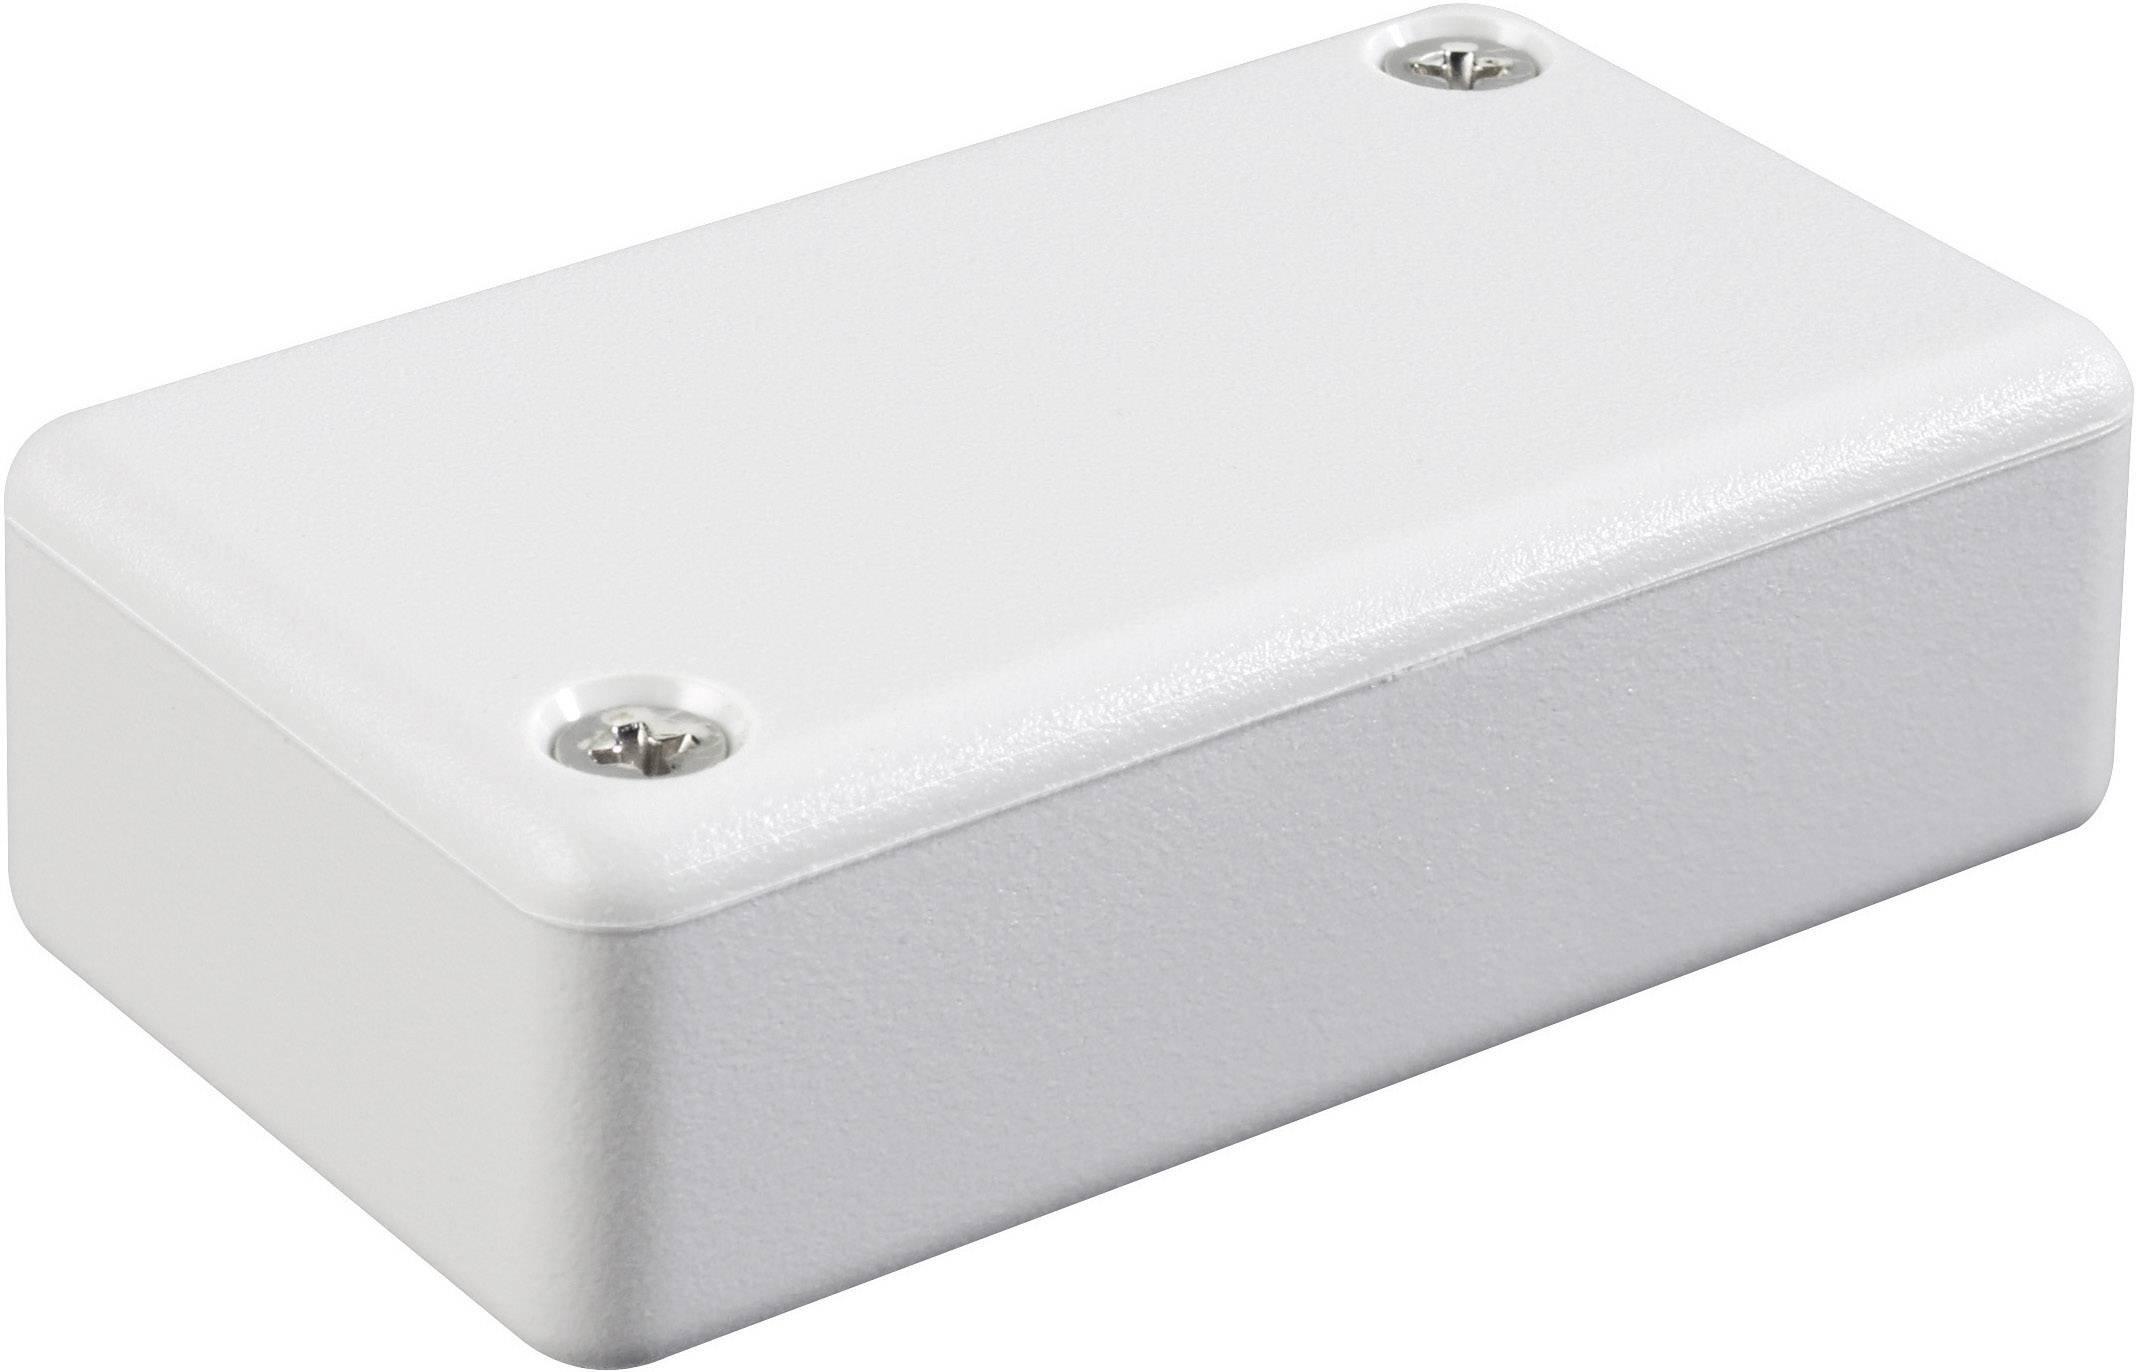 Euro krabice Hammond Electronics 1551GGY 1551GGY, 50 x 35 x 20 , ABS, svetlo sivá (RAL 7035), 1 ks